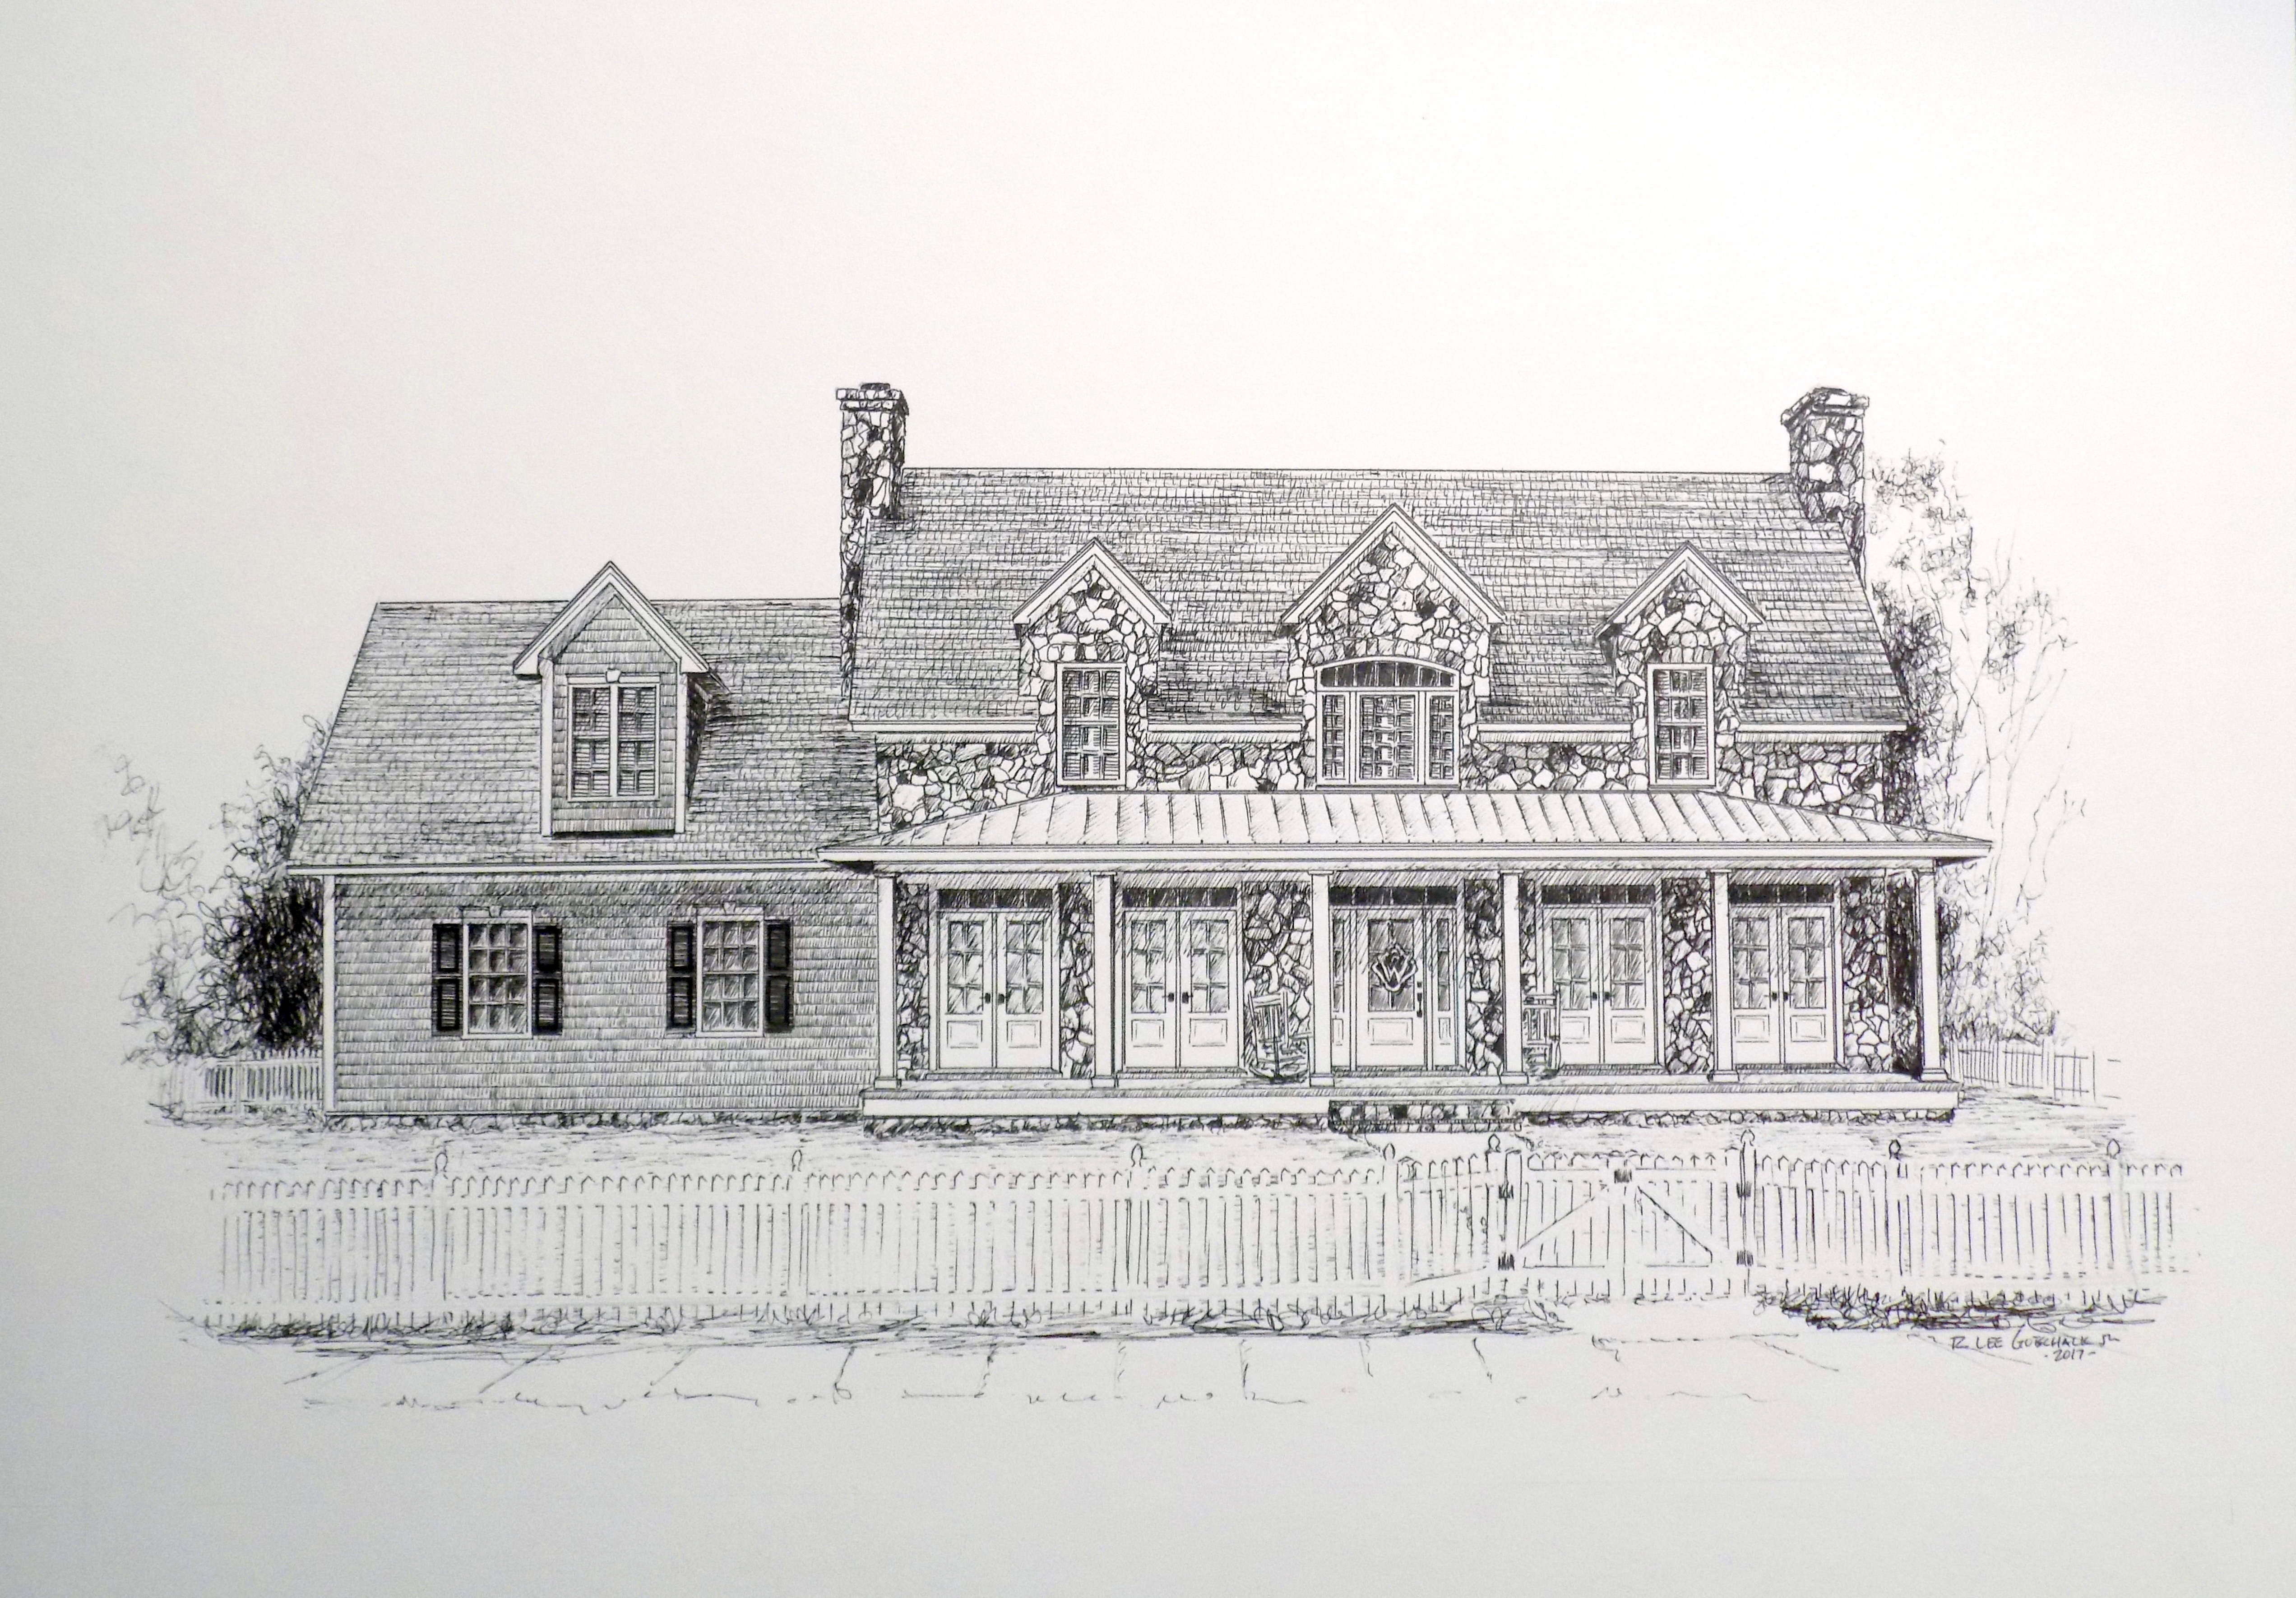 Watt's House